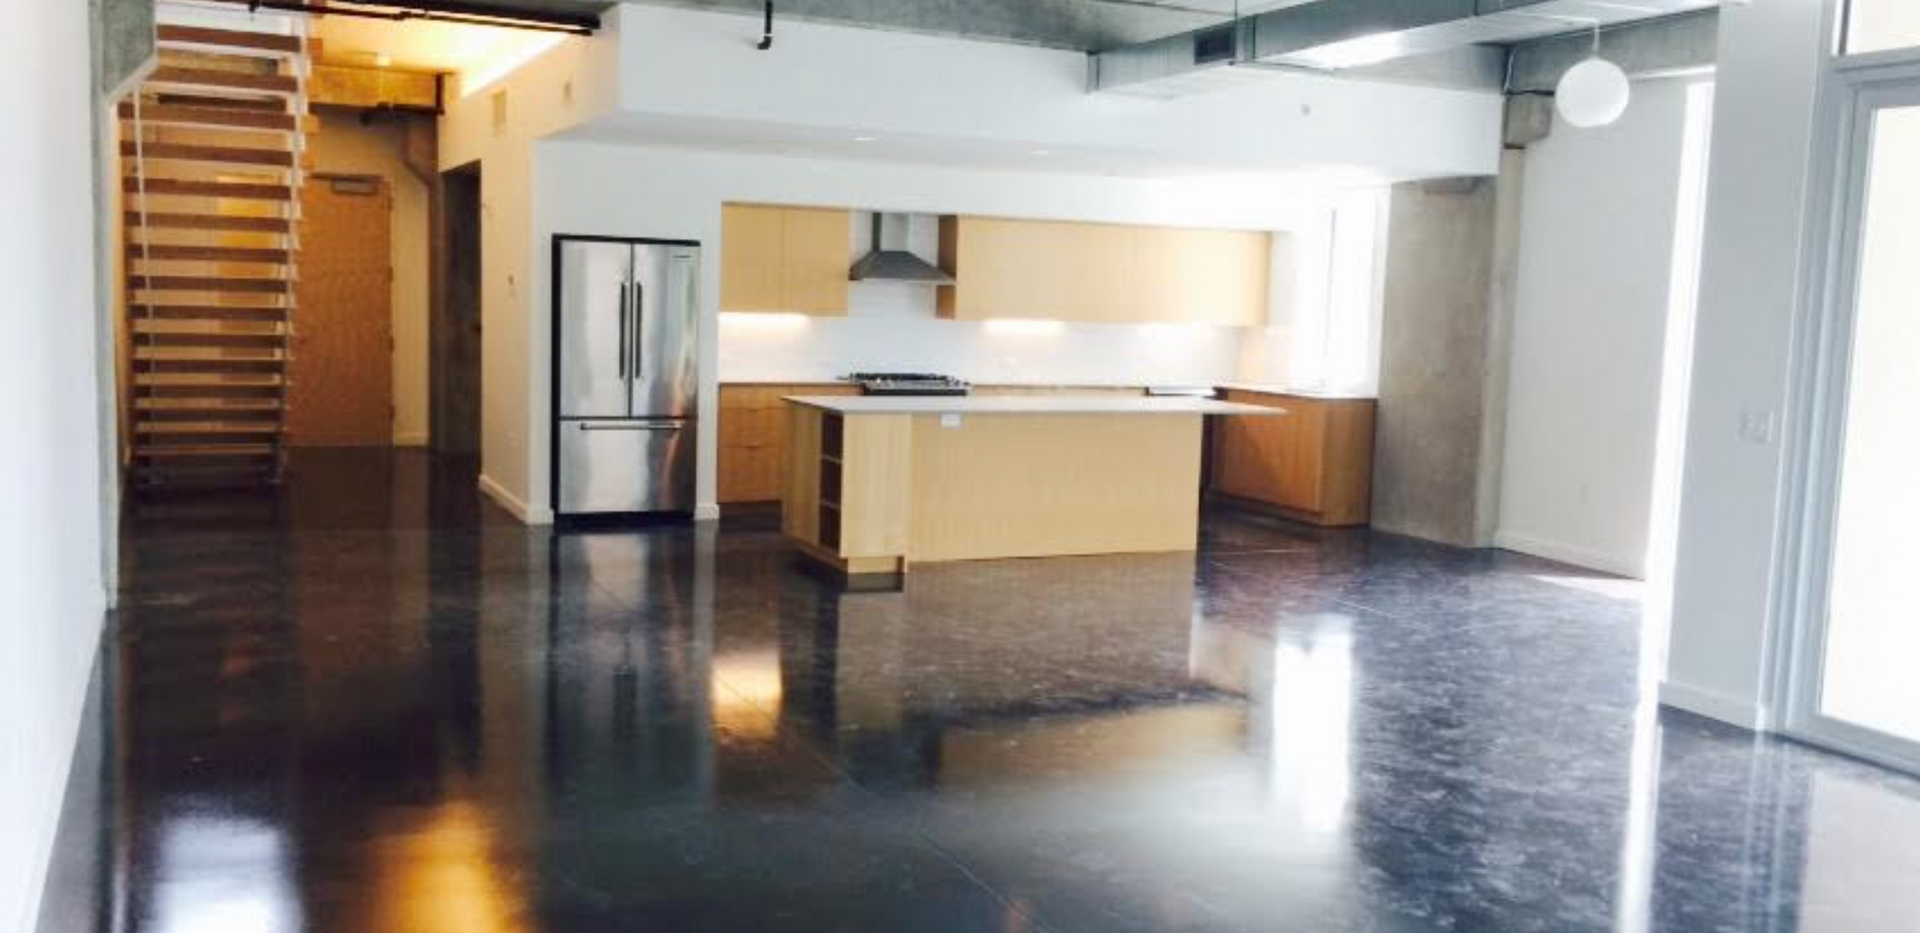 Studio 209 Kitchen.png